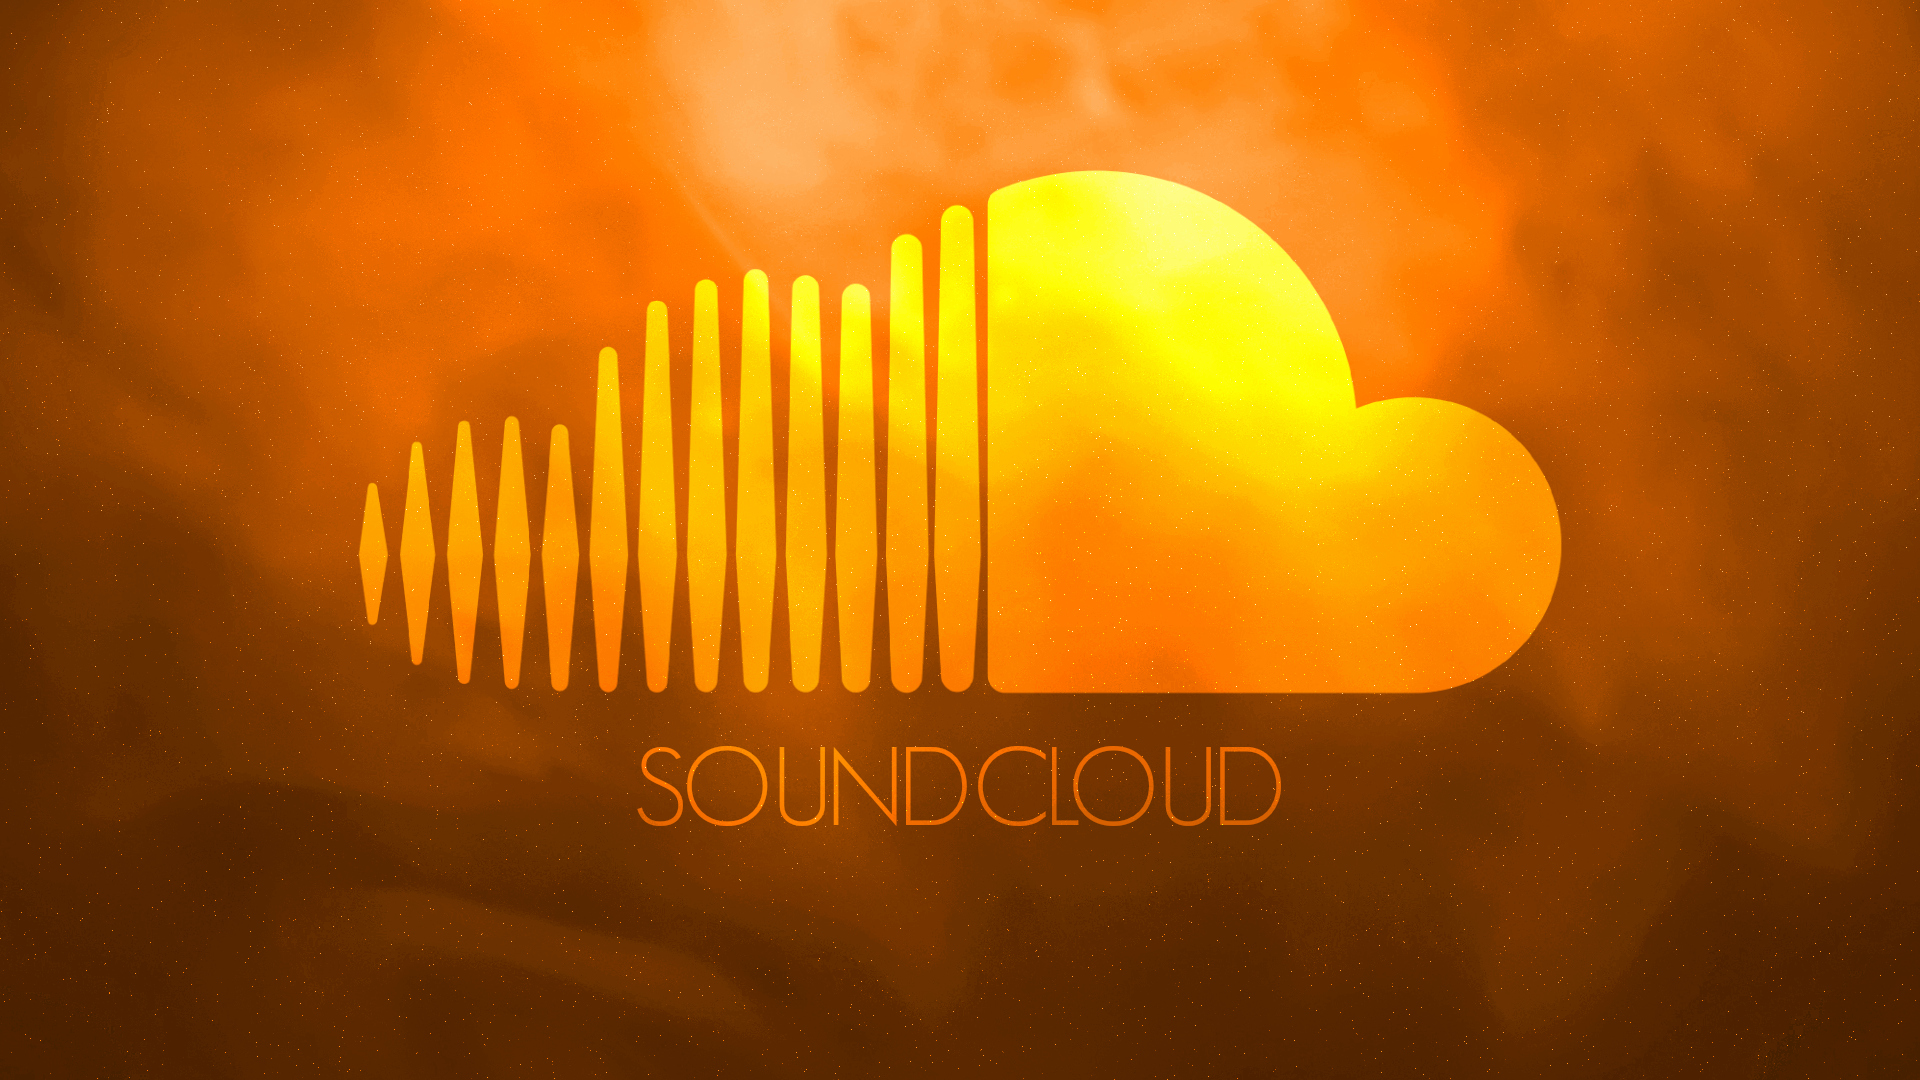 Soundcloud wallpaper   Orange Galaxy by ChrisFR06 1920x1080